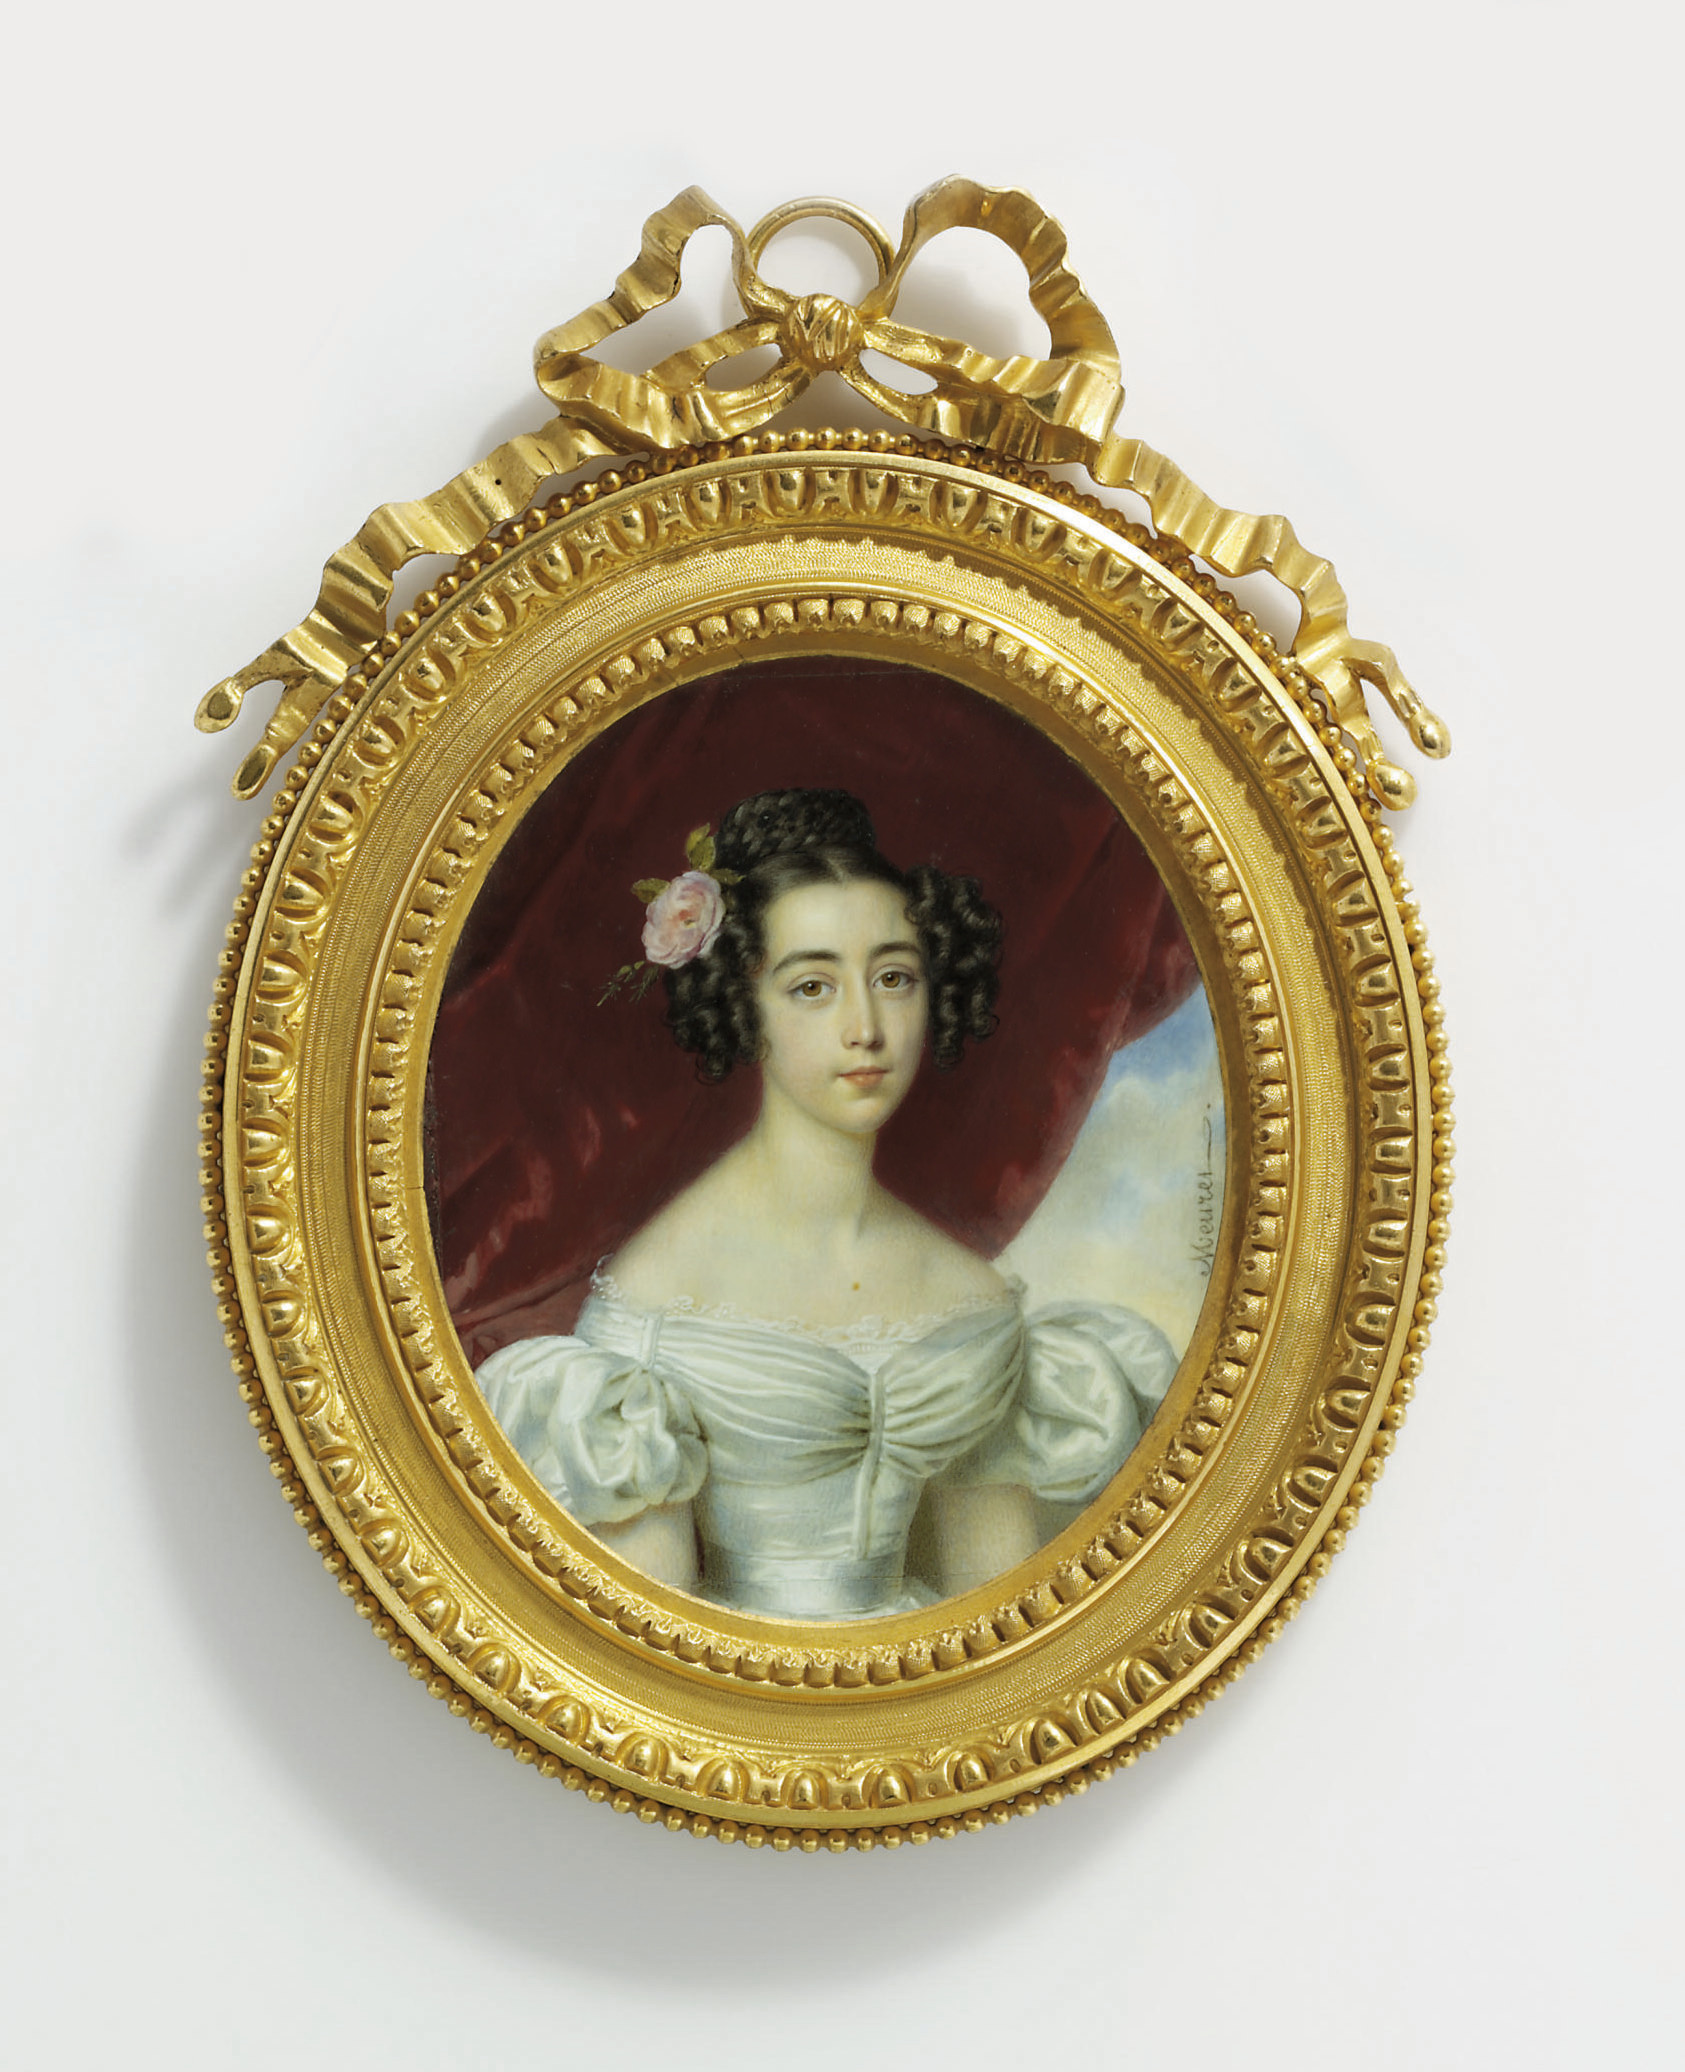 FRANÇOIS MEURET (FRENCH, 1800-